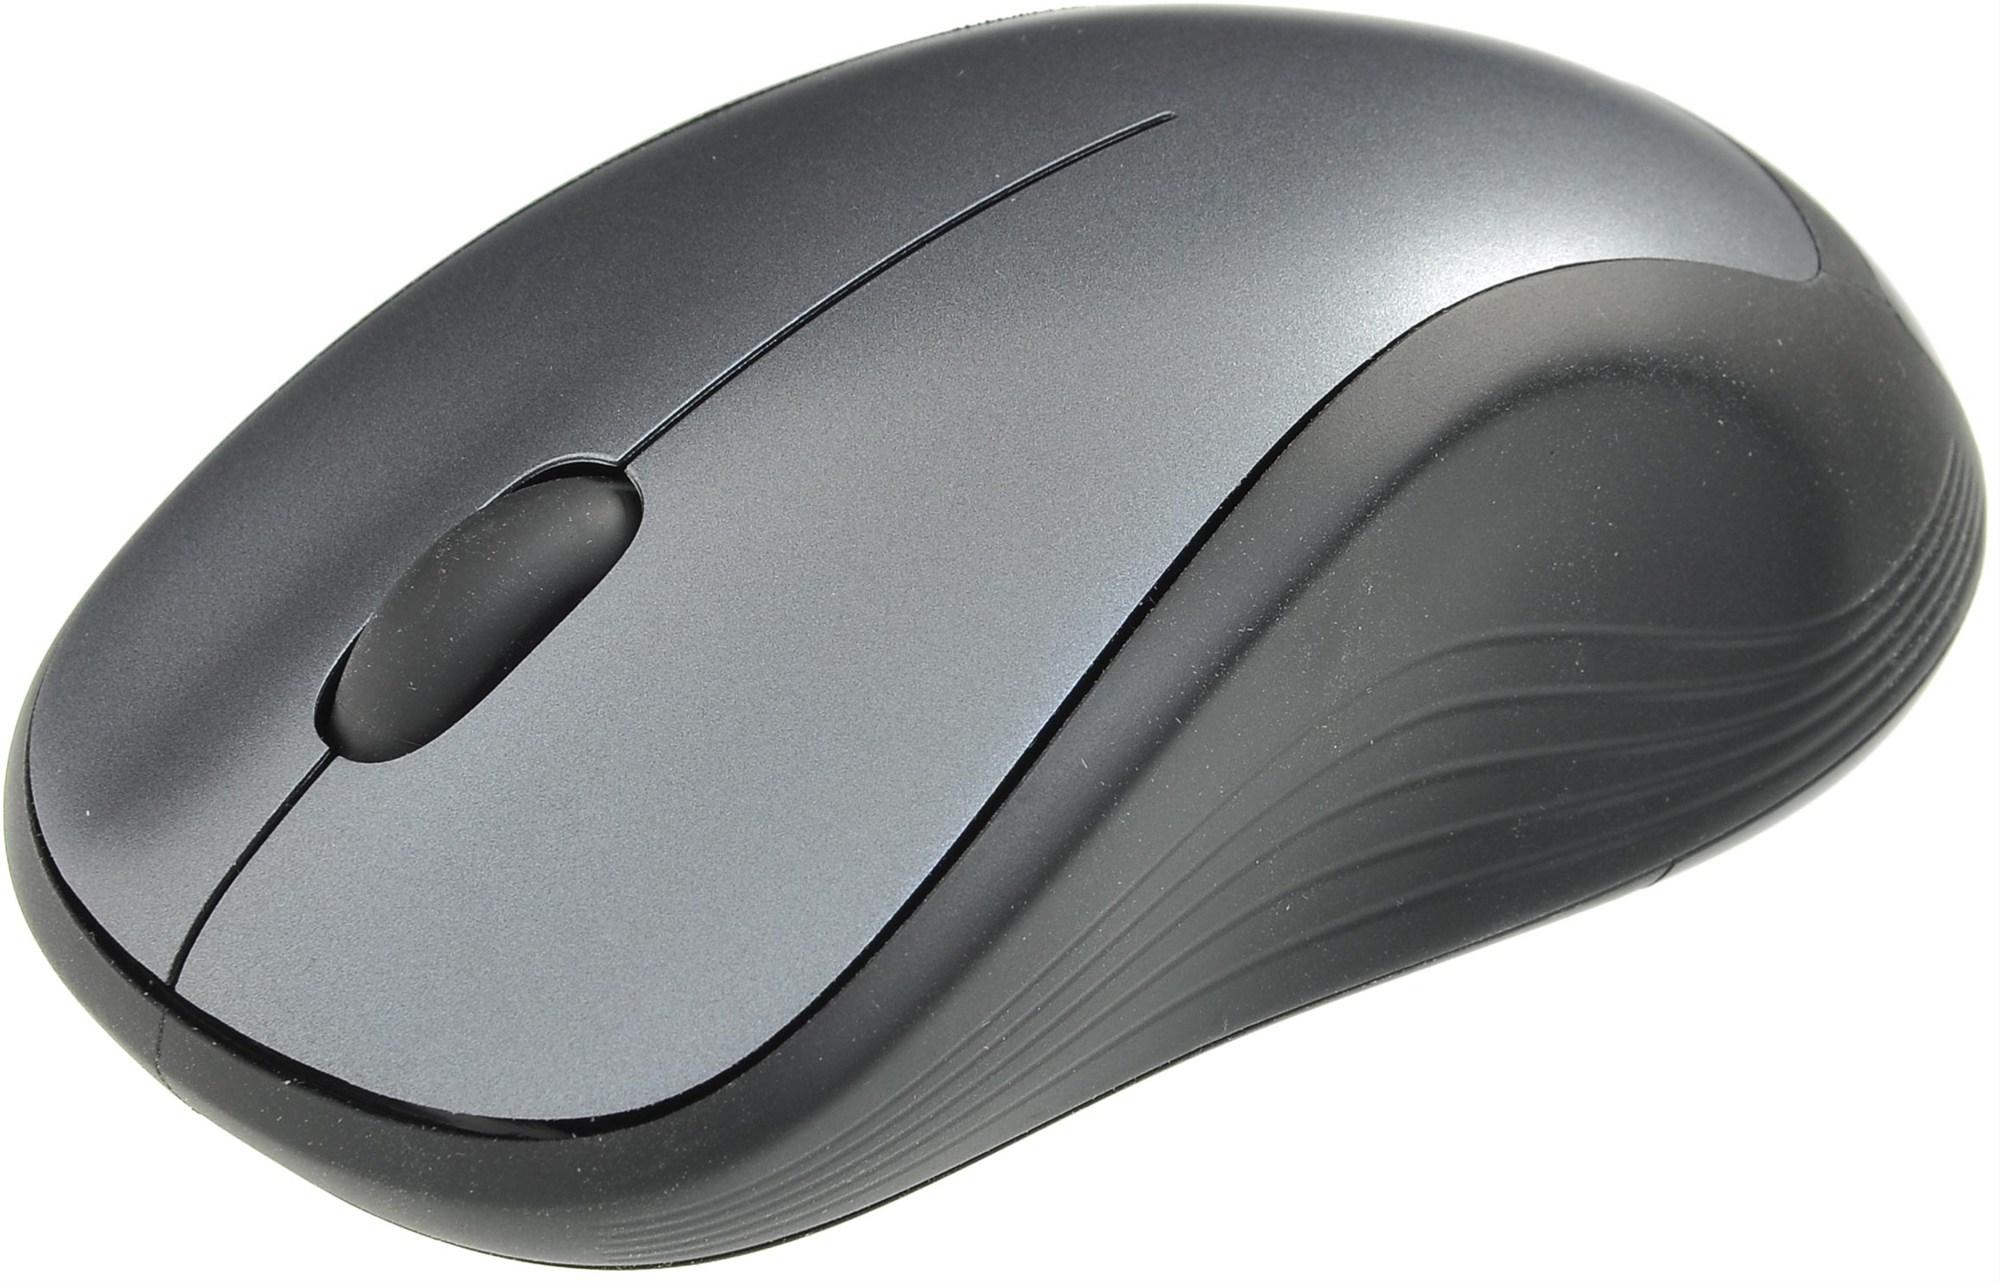 Myš Logitech